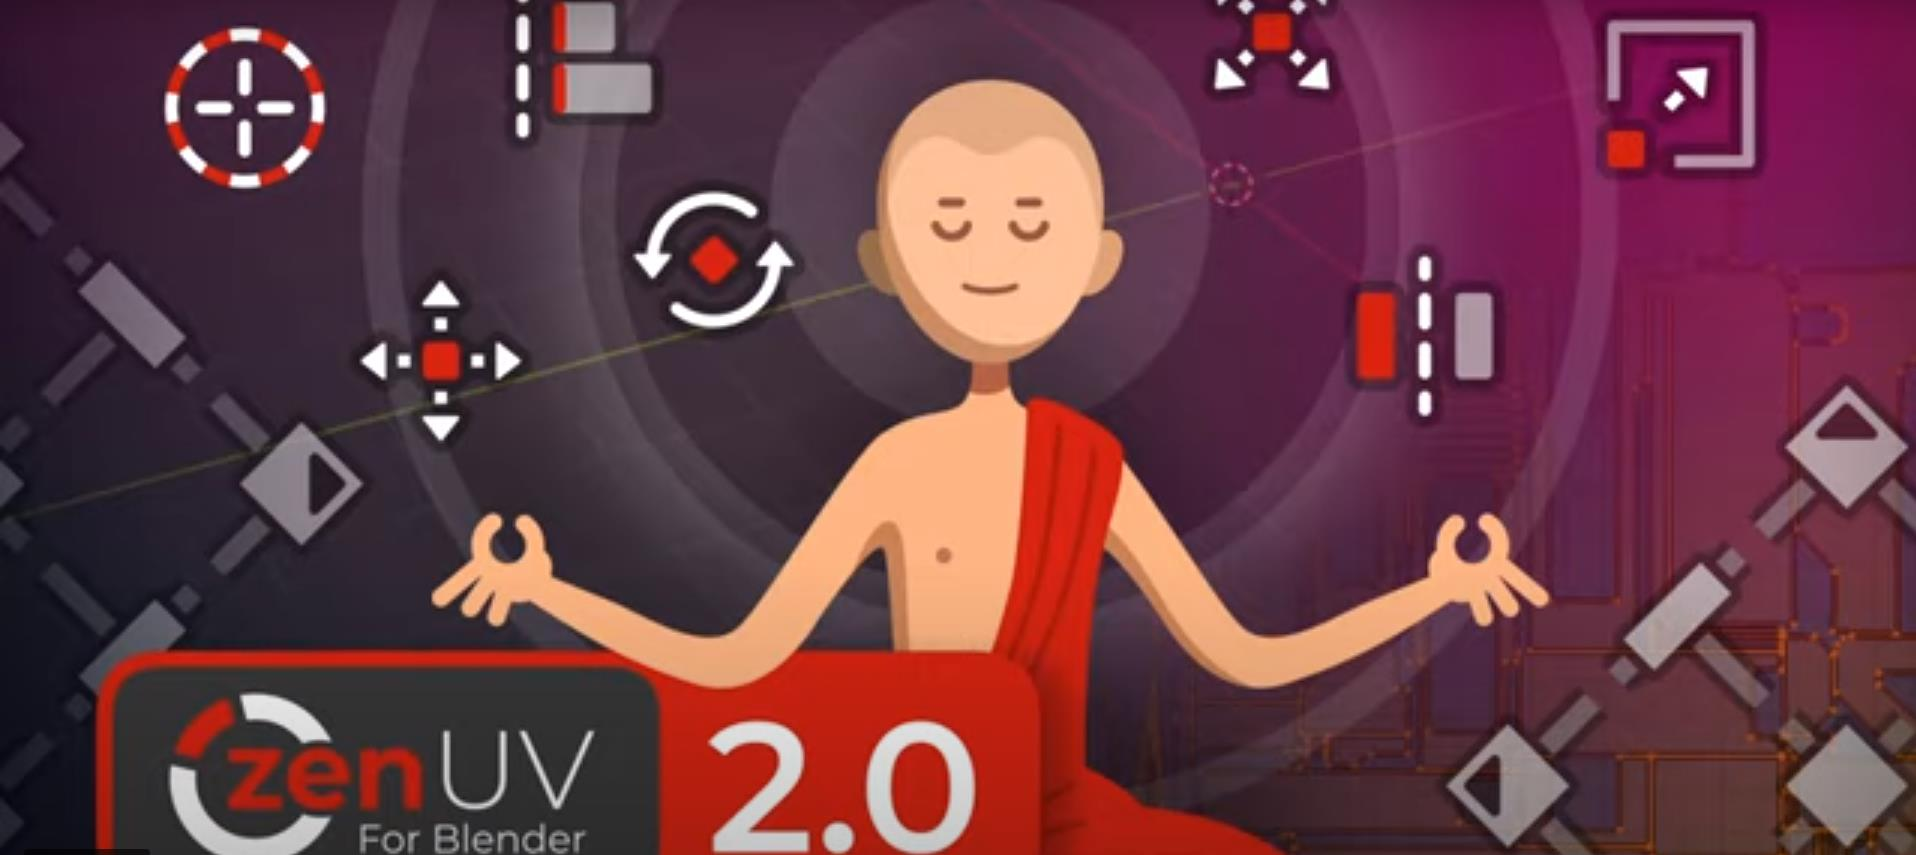 Blender的Zen UV已经更新 新功能介绍